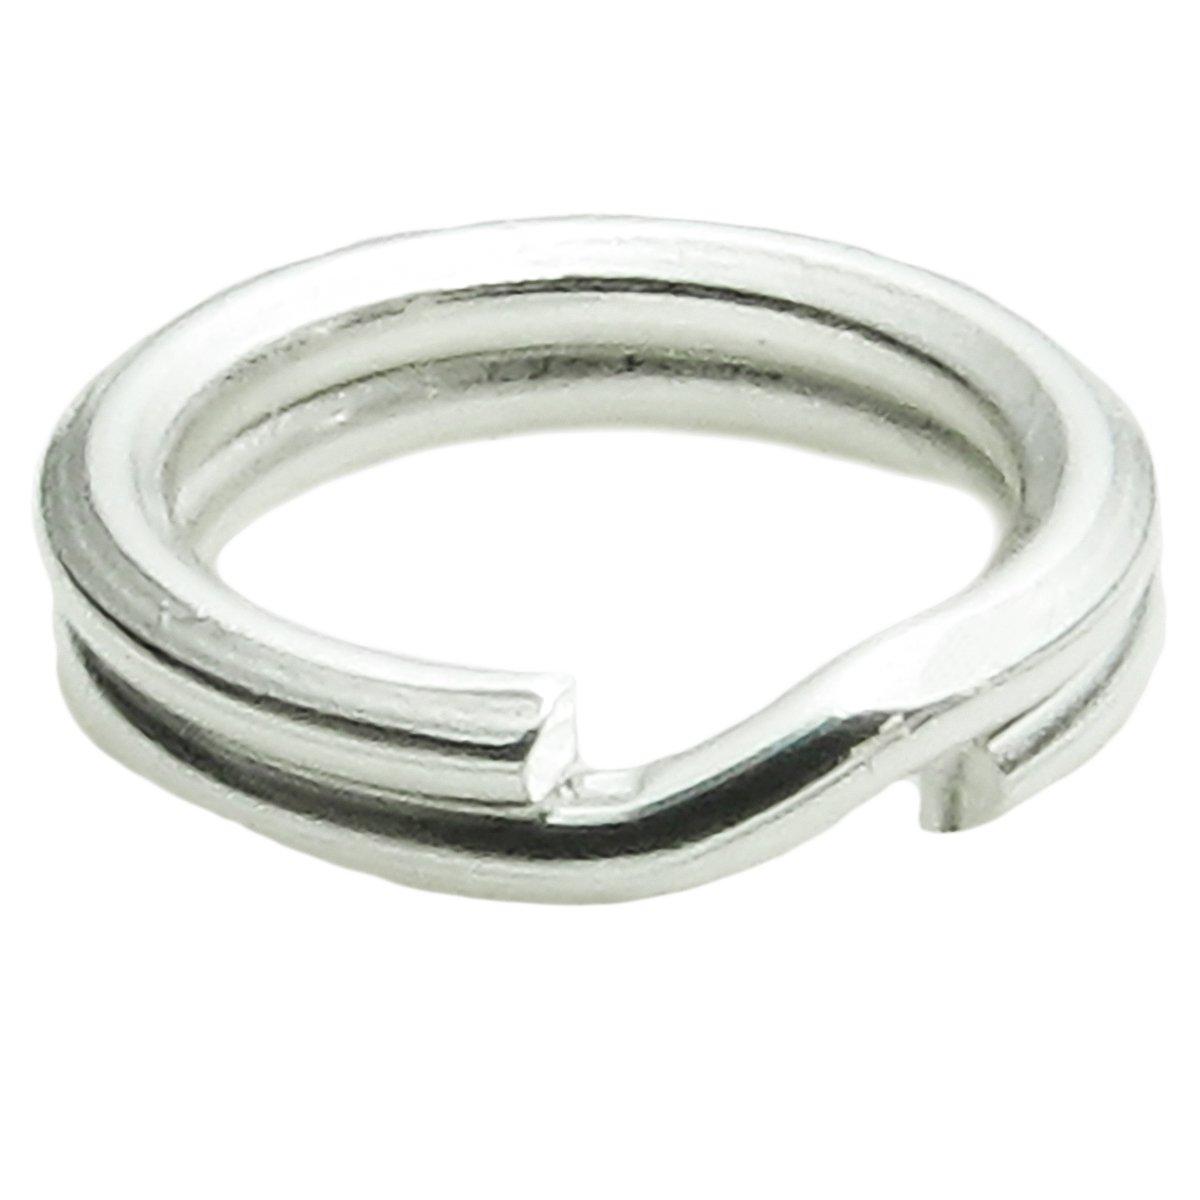 Amazon.com: 20 pcs 925 Sterling Silver 5mm Round Split Jump Ring 24 ...